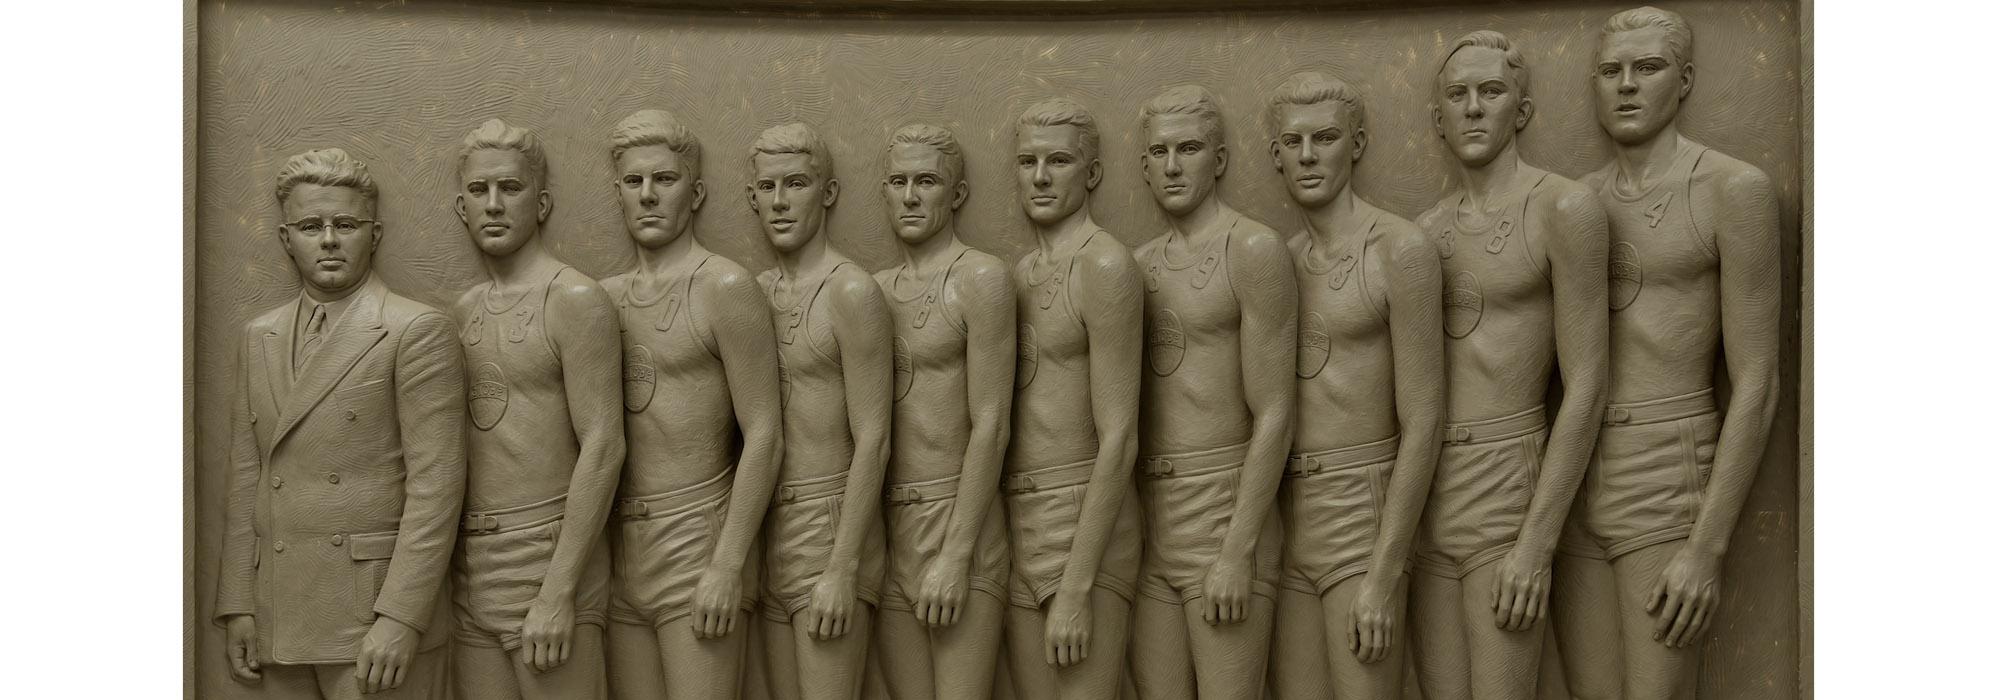 Sutton Betti, Globe Refiners, McPherson, Kansas, basketball monument